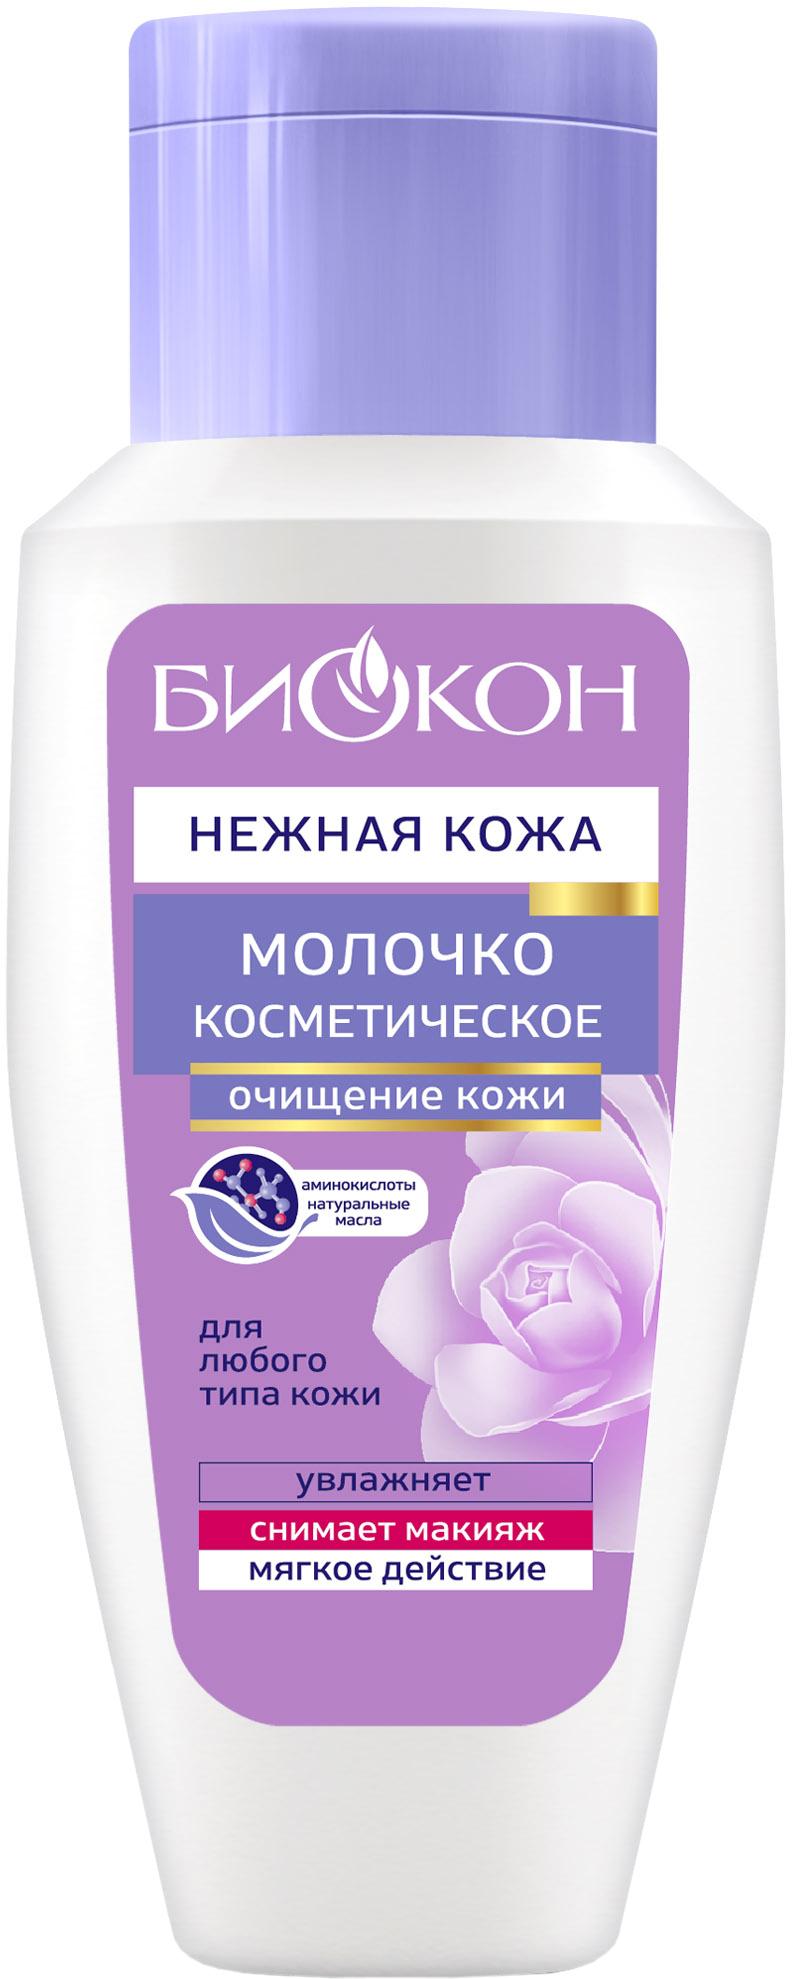 Молочко Биокон Нежная Кожа косметическое 150 мл